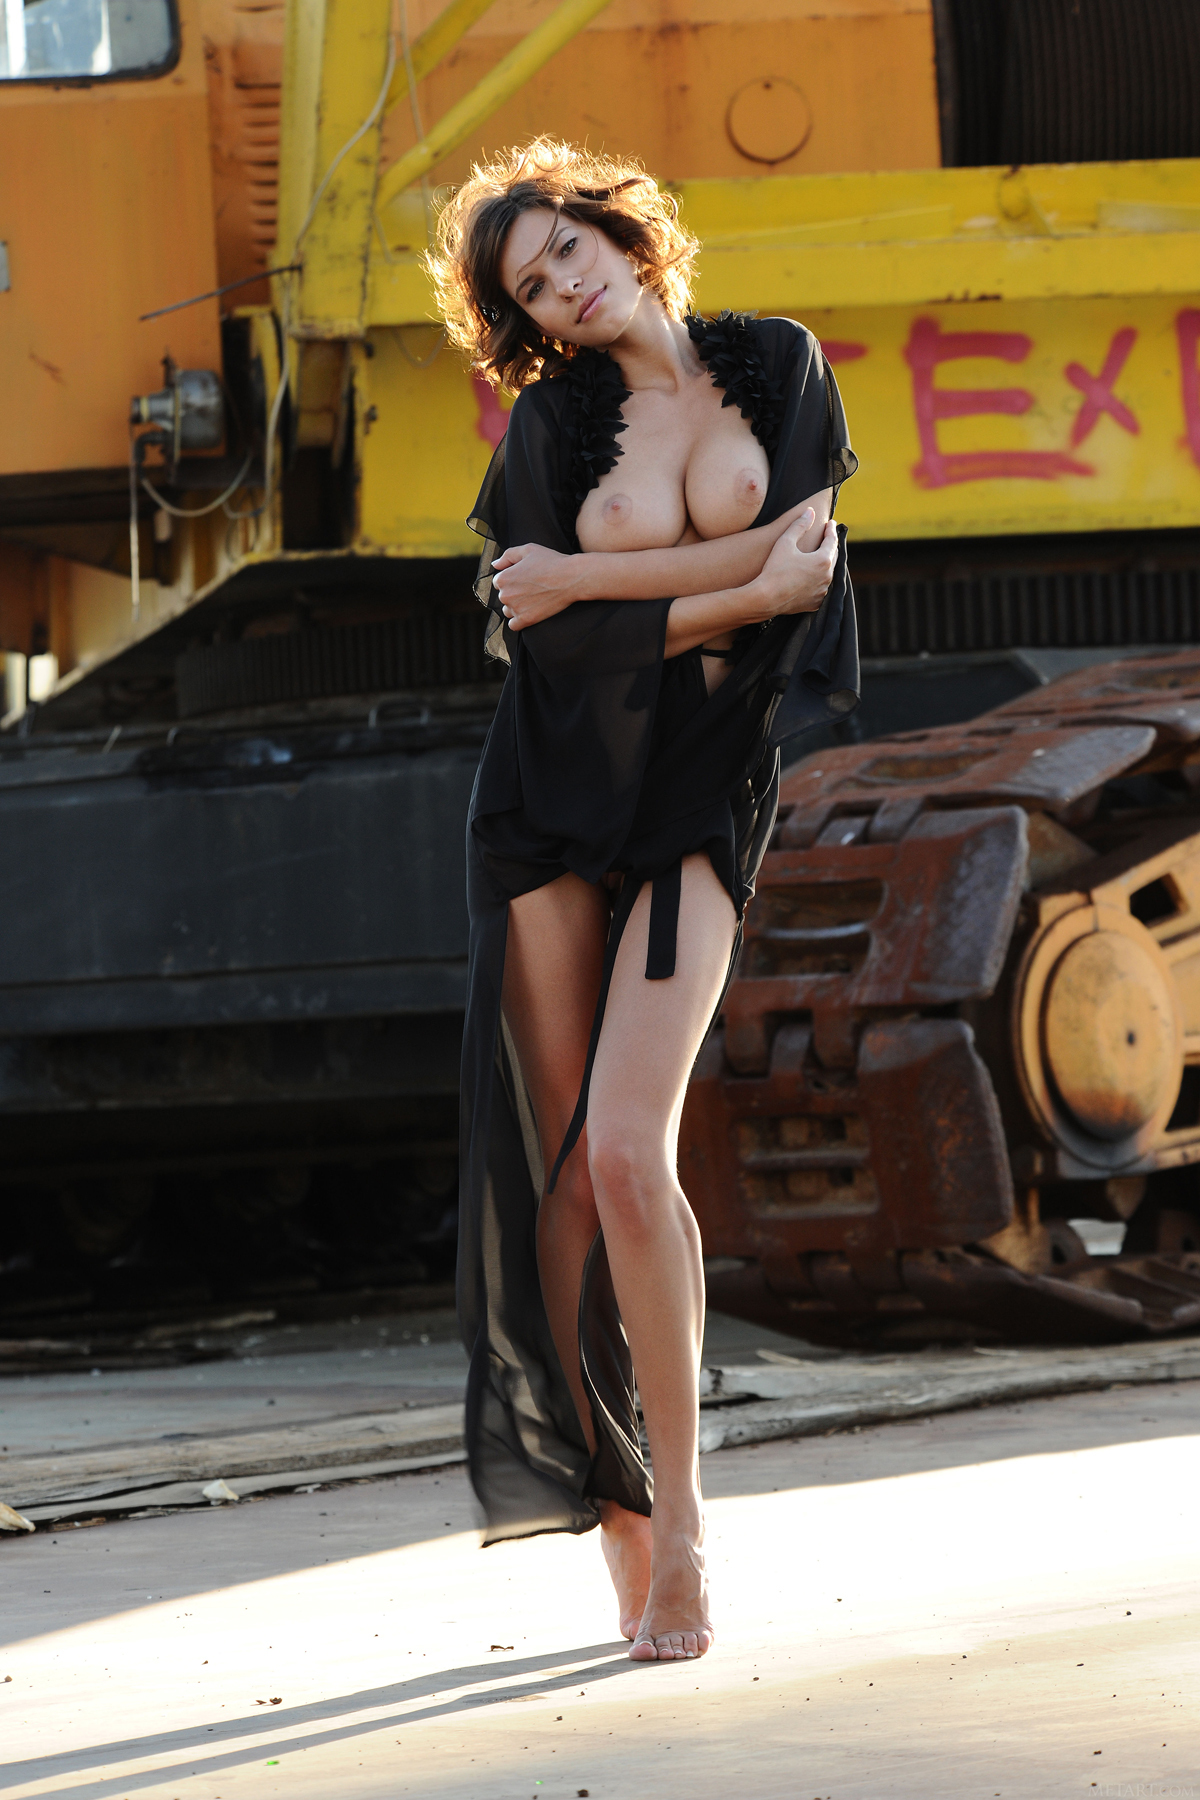 PHOTO | 00 231 - Beautiful Suzanna A - Crawler Crane